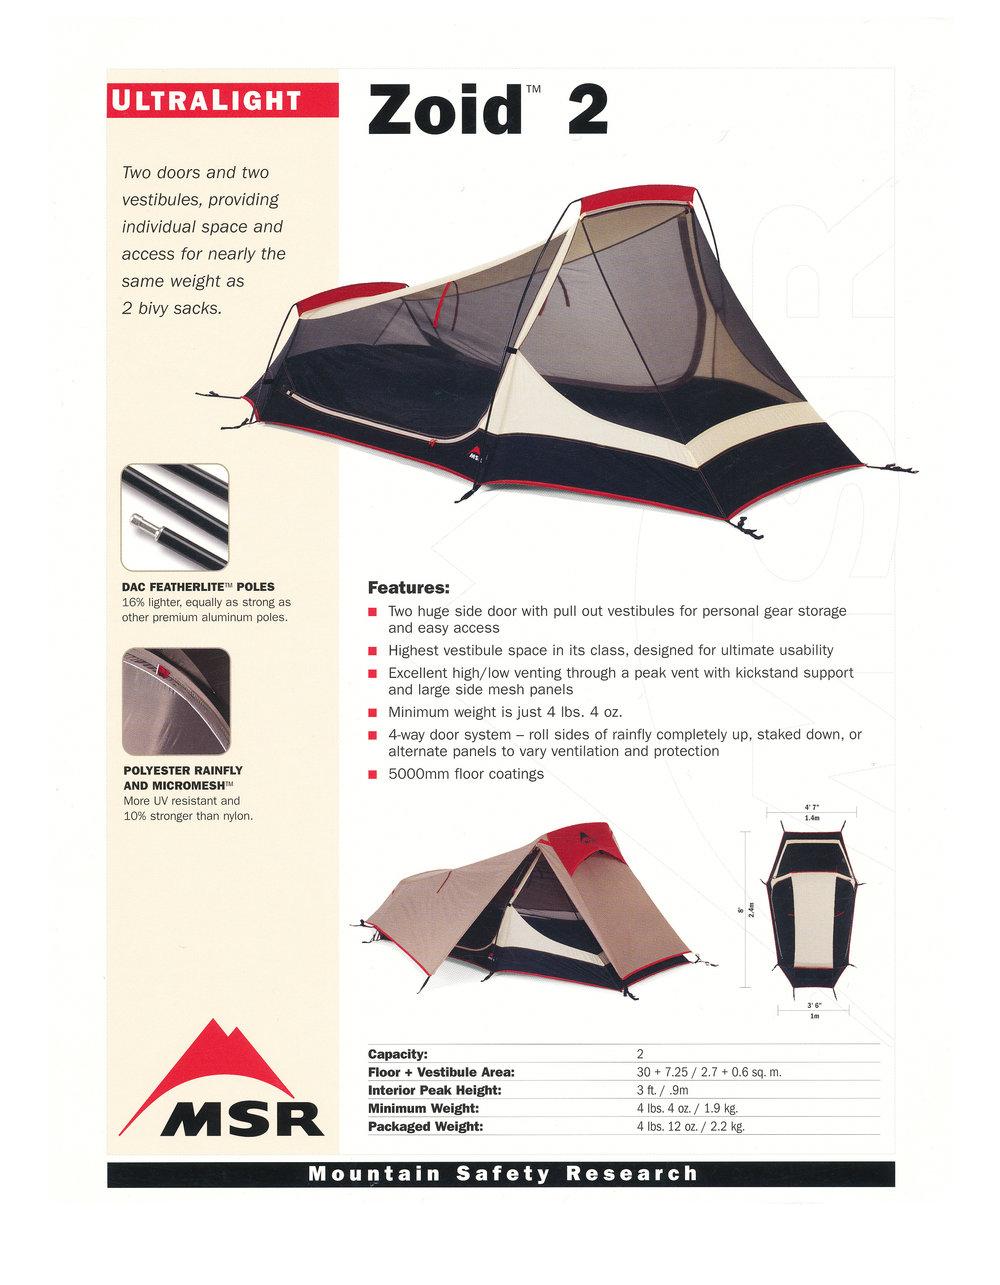 MSR Tents zoid 2.2.jpg  sc 1 st  jim giblin & MSR Zoid 2 u2014 JIM GIBLIN